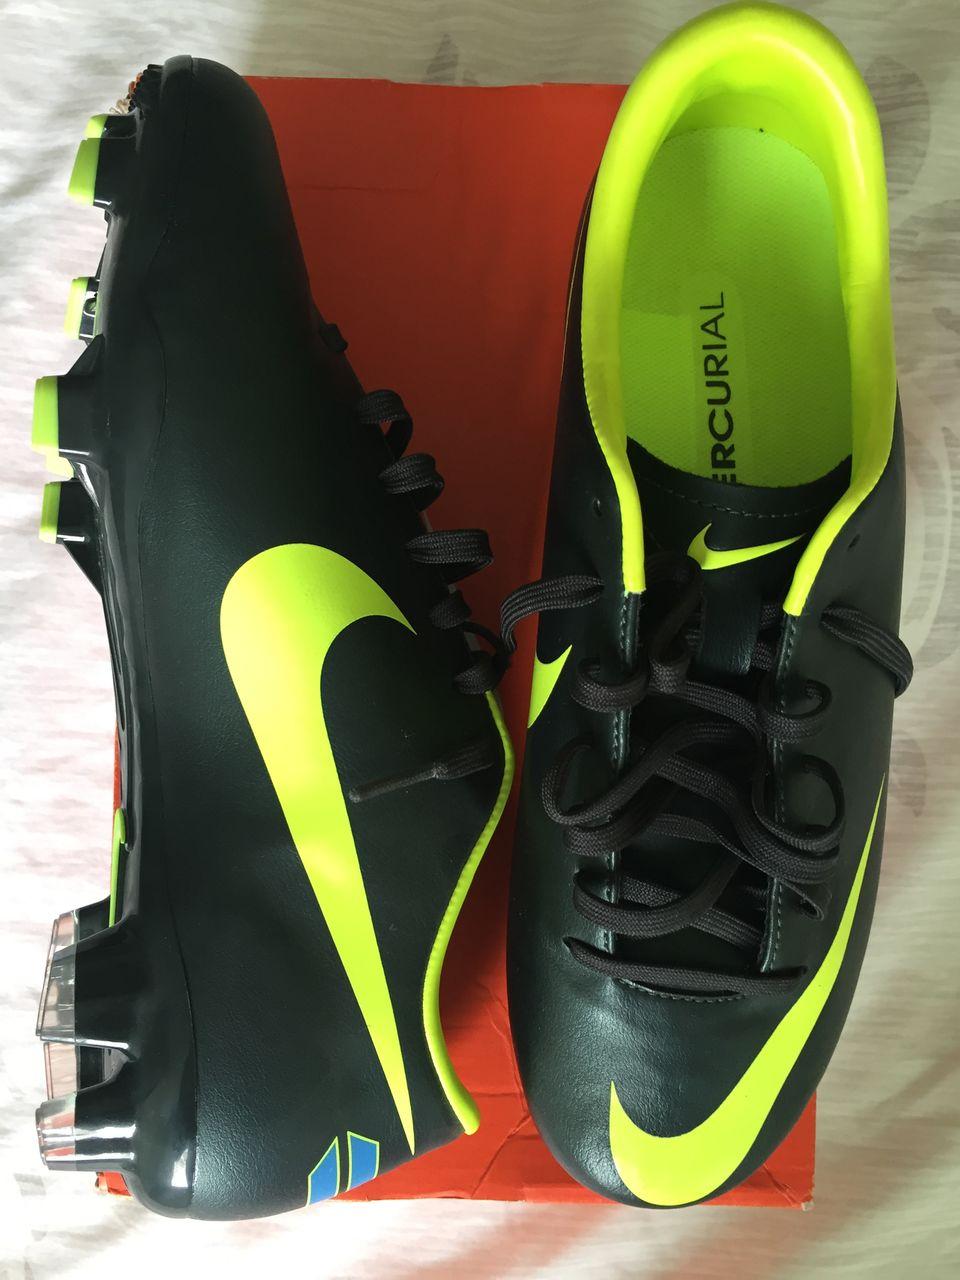 Yükle (960x1280)Продам новые - Nike Football Boots - Nike Mercurial Victory  III FG - EU 39Nike Football Boots - Nike Mercurial Victory III FG  Seaweed Volt ... b116bfa724